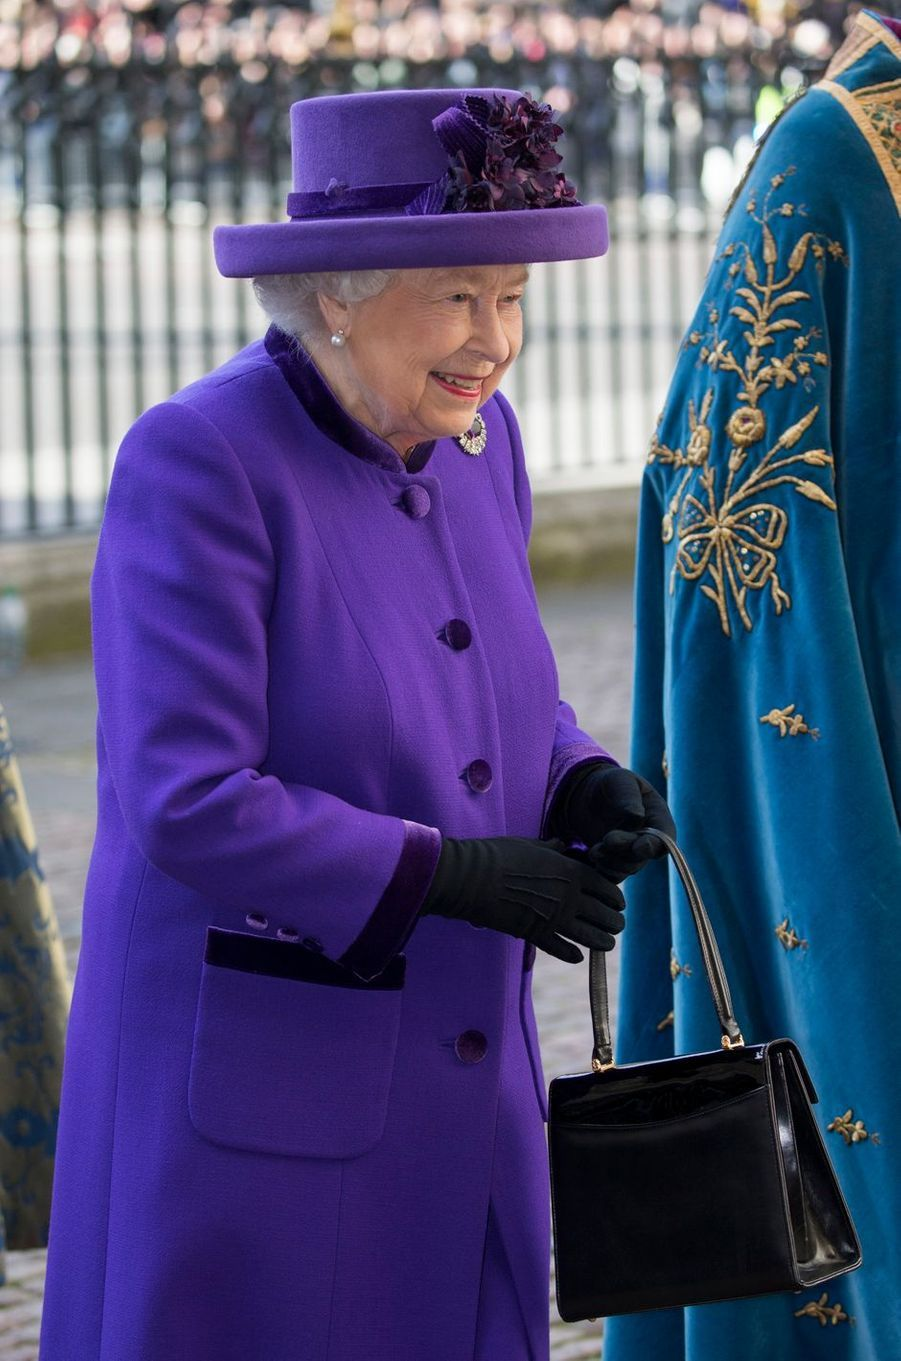 La reine Elizabeth II en total look violet à Londres, le 11 mars 2019